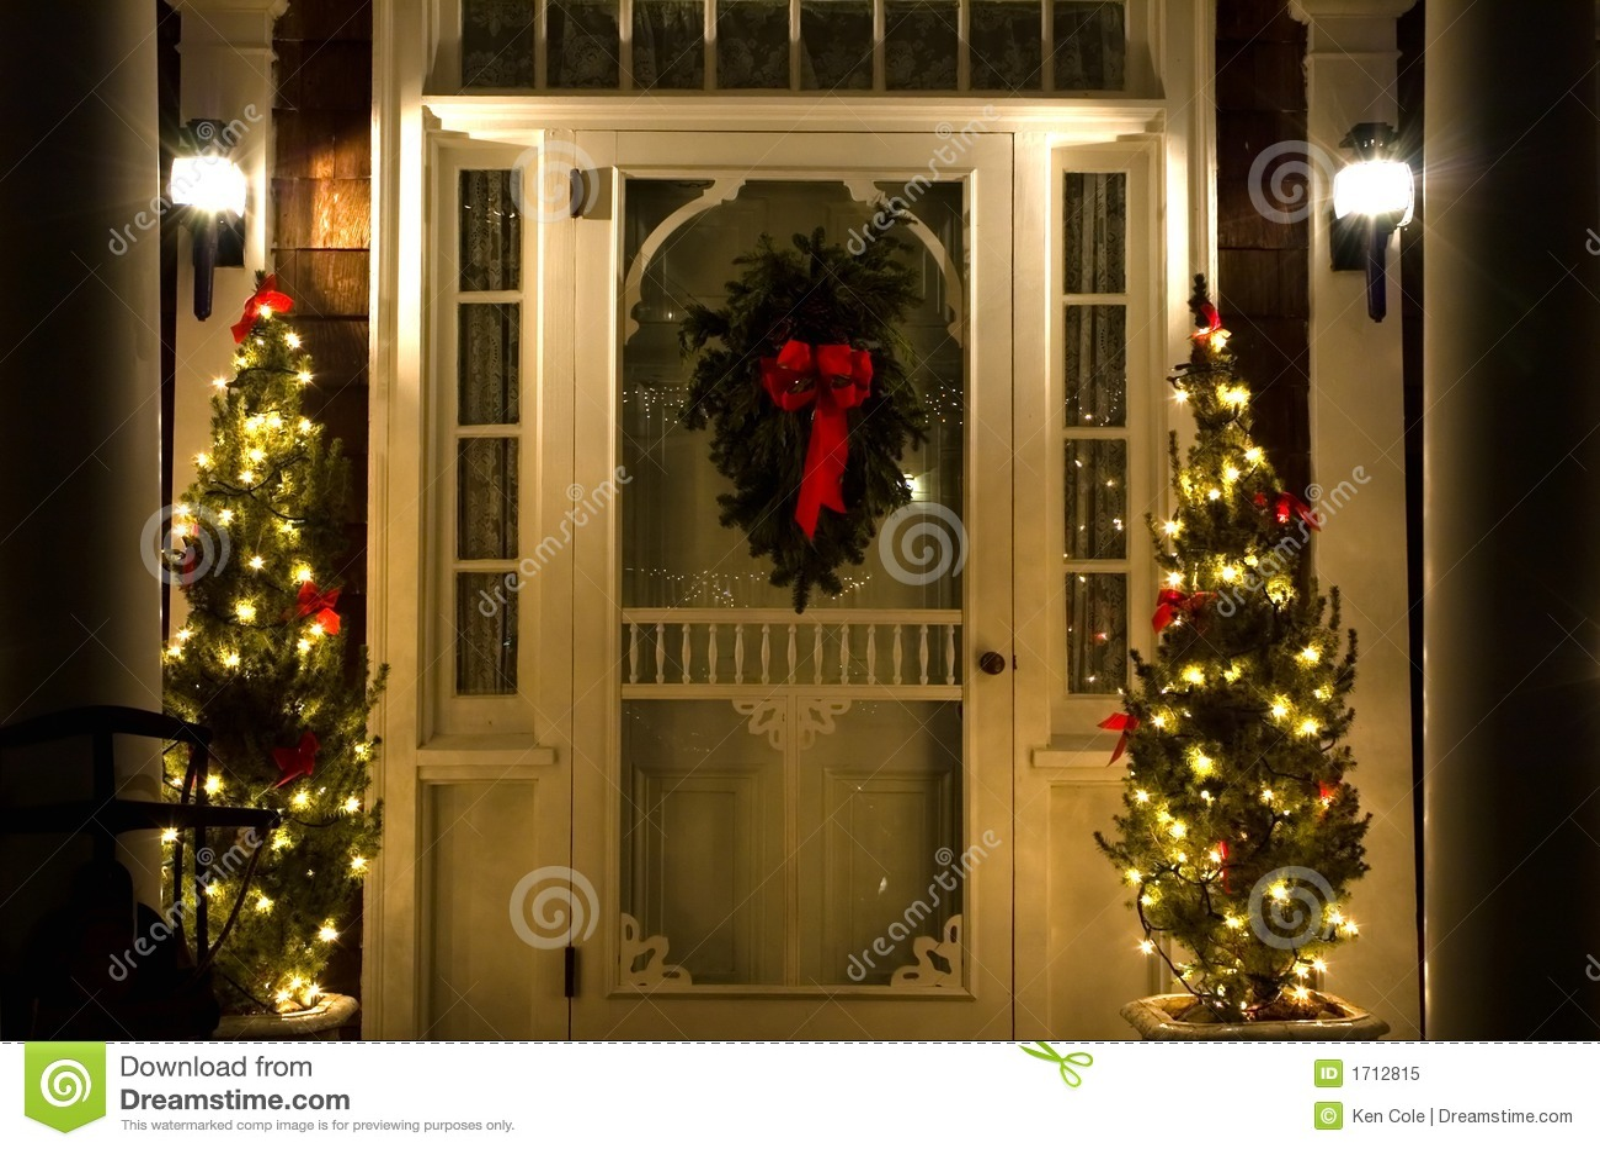 Elegant Christmas Doorway At Night Stock Image Image Of